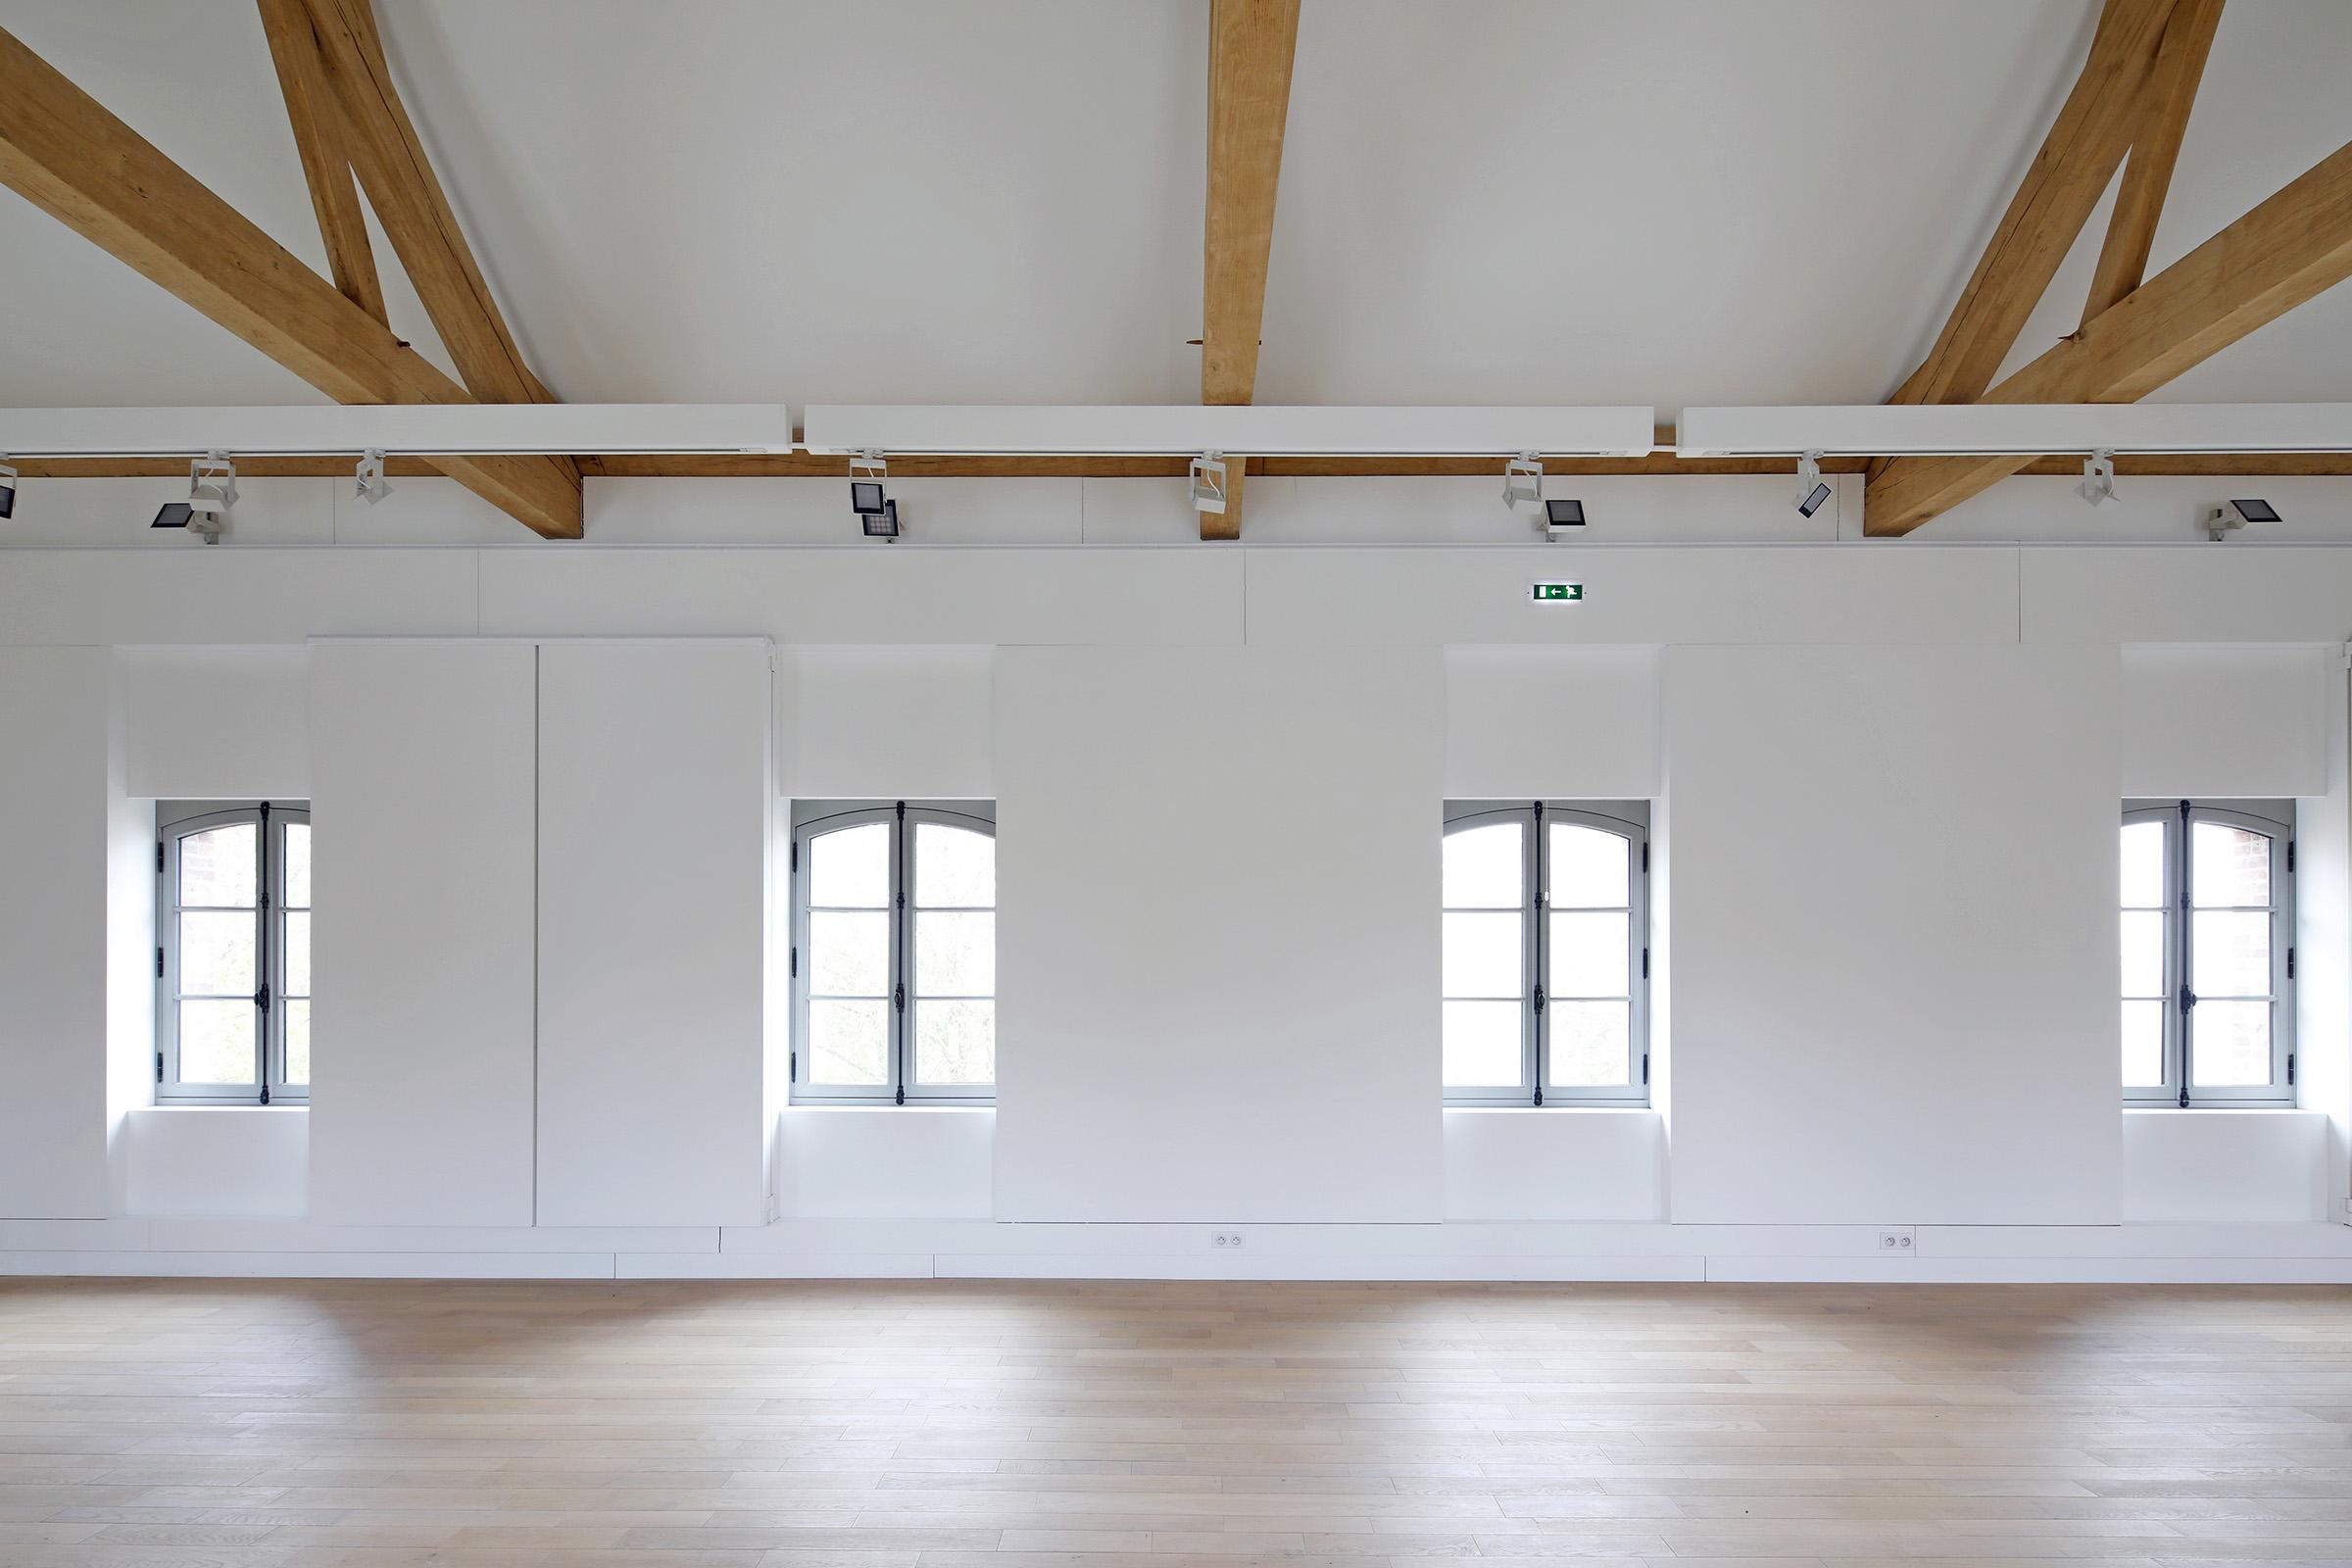 Amilly - La Maison Saint Loup - Interieur - Sylvain Dubuisson 037.jpg